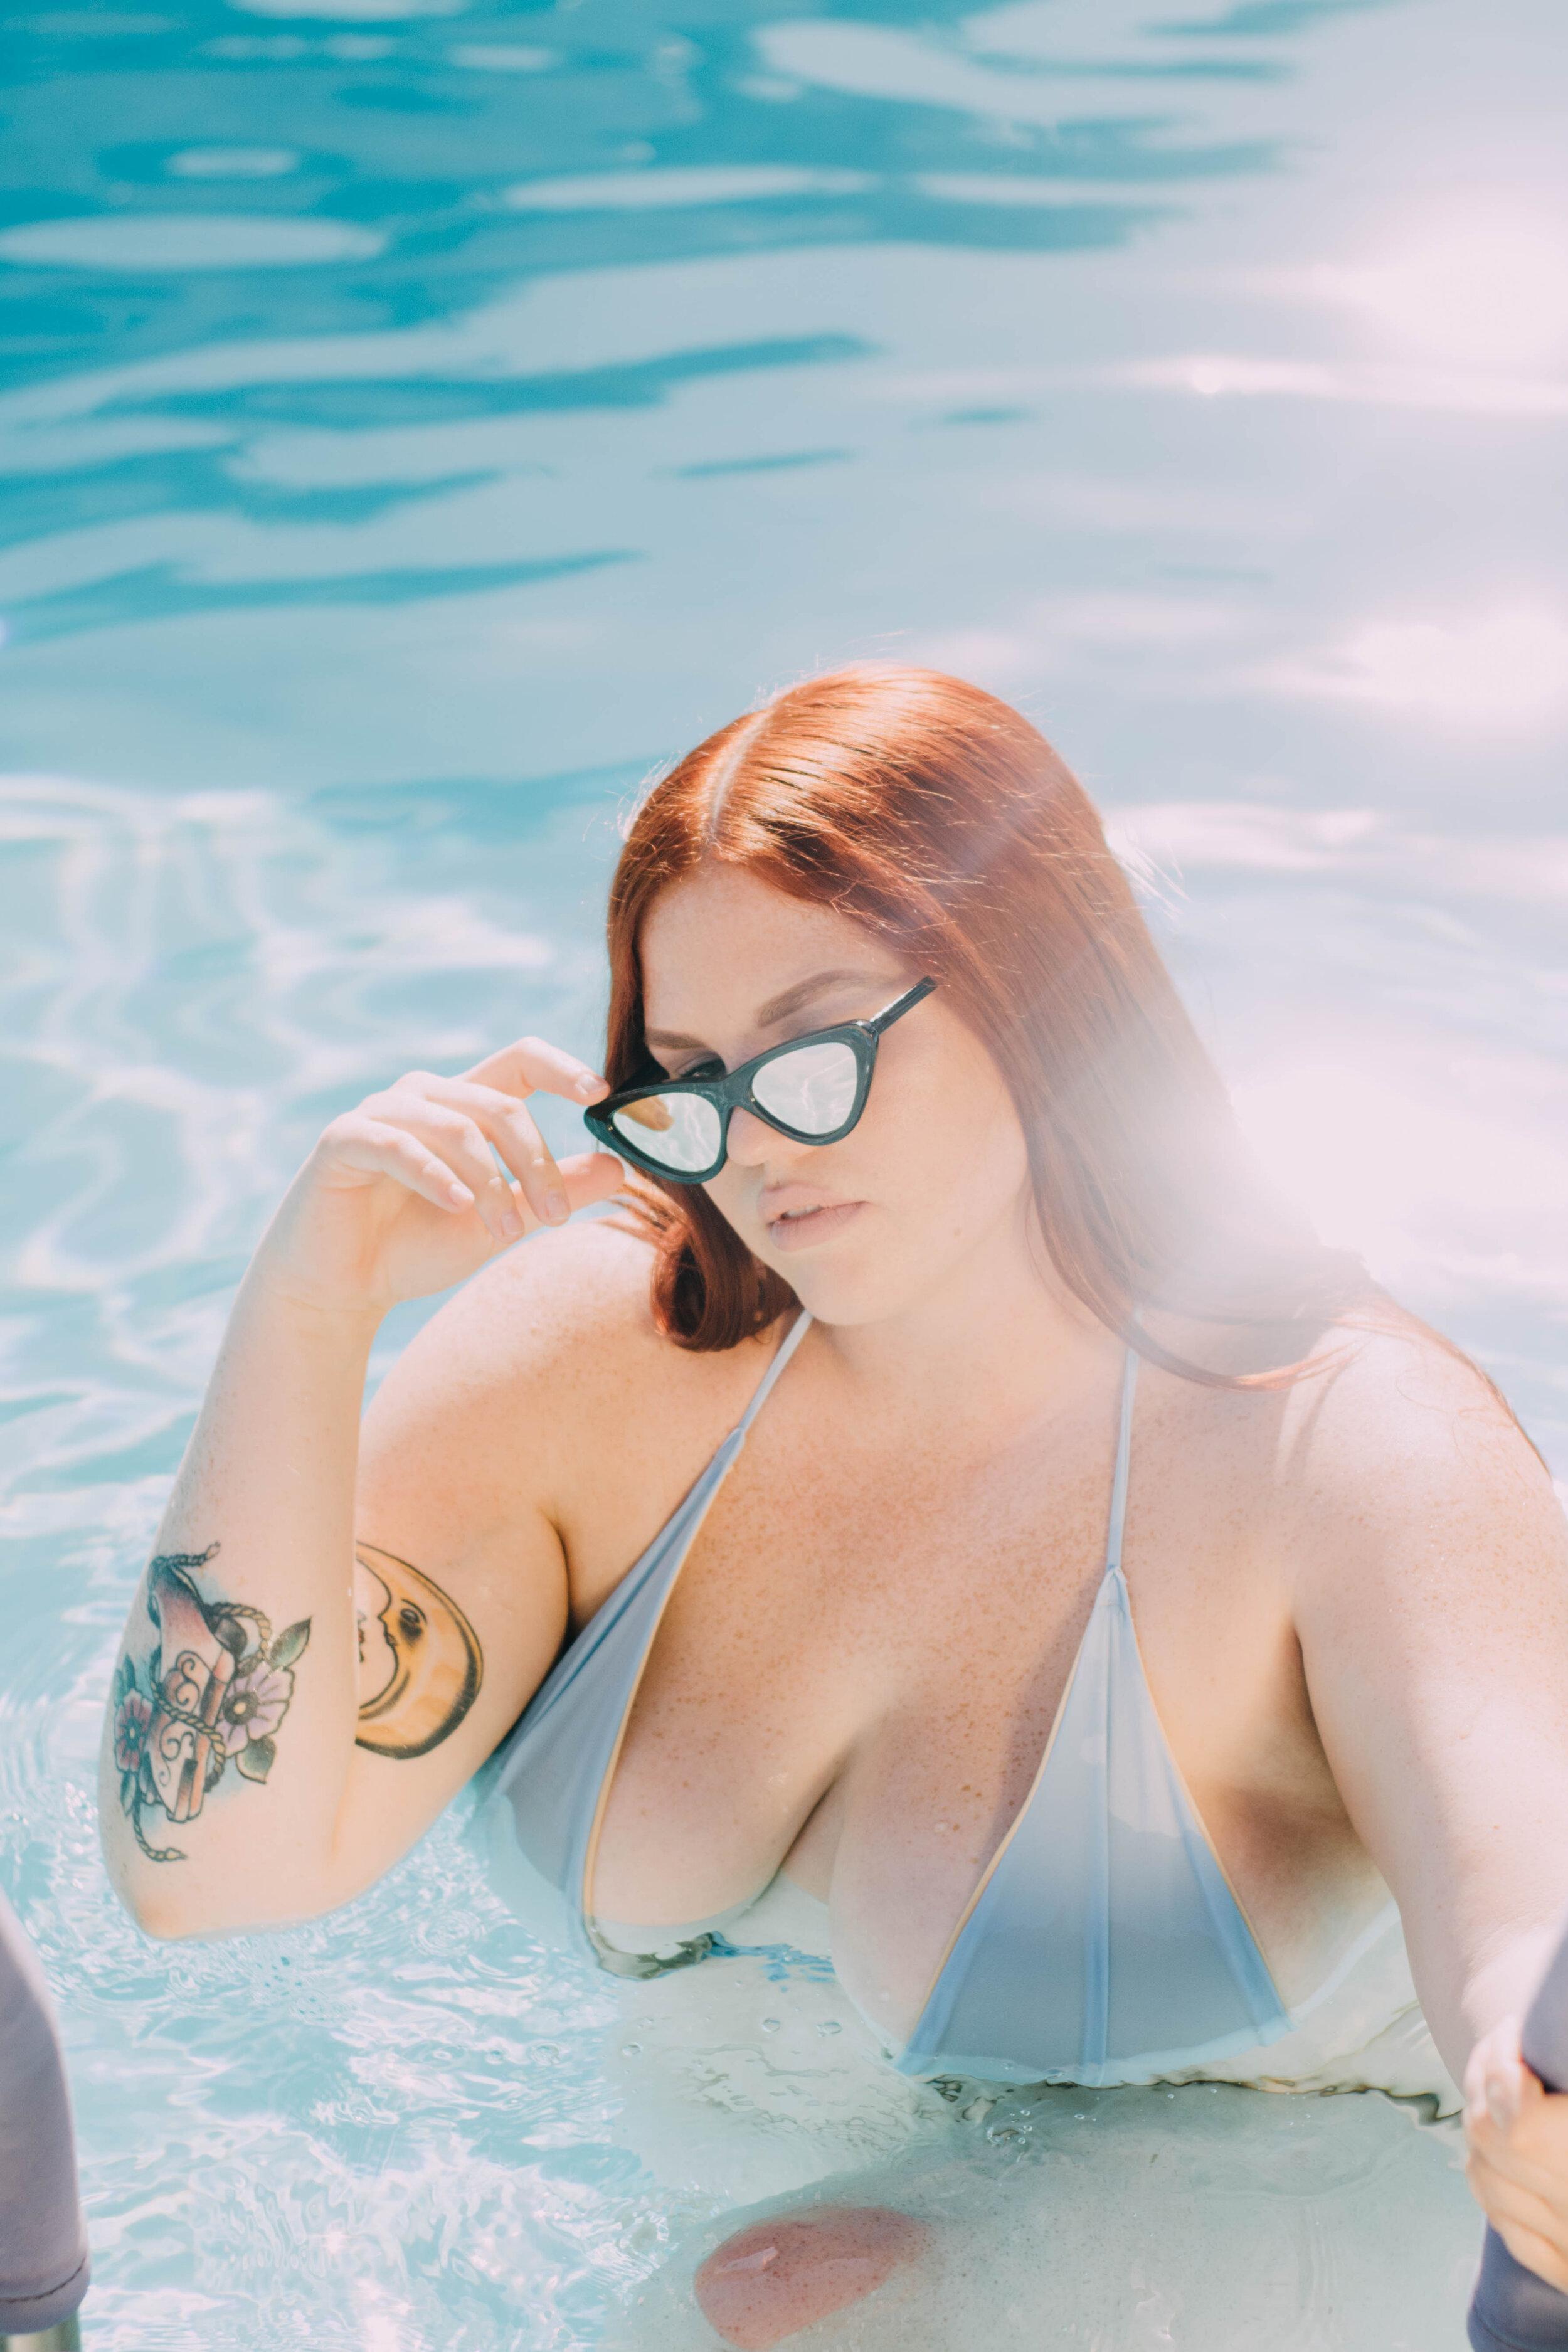 Soapbox-Kelsey-Ris-Marek-1392.jpg